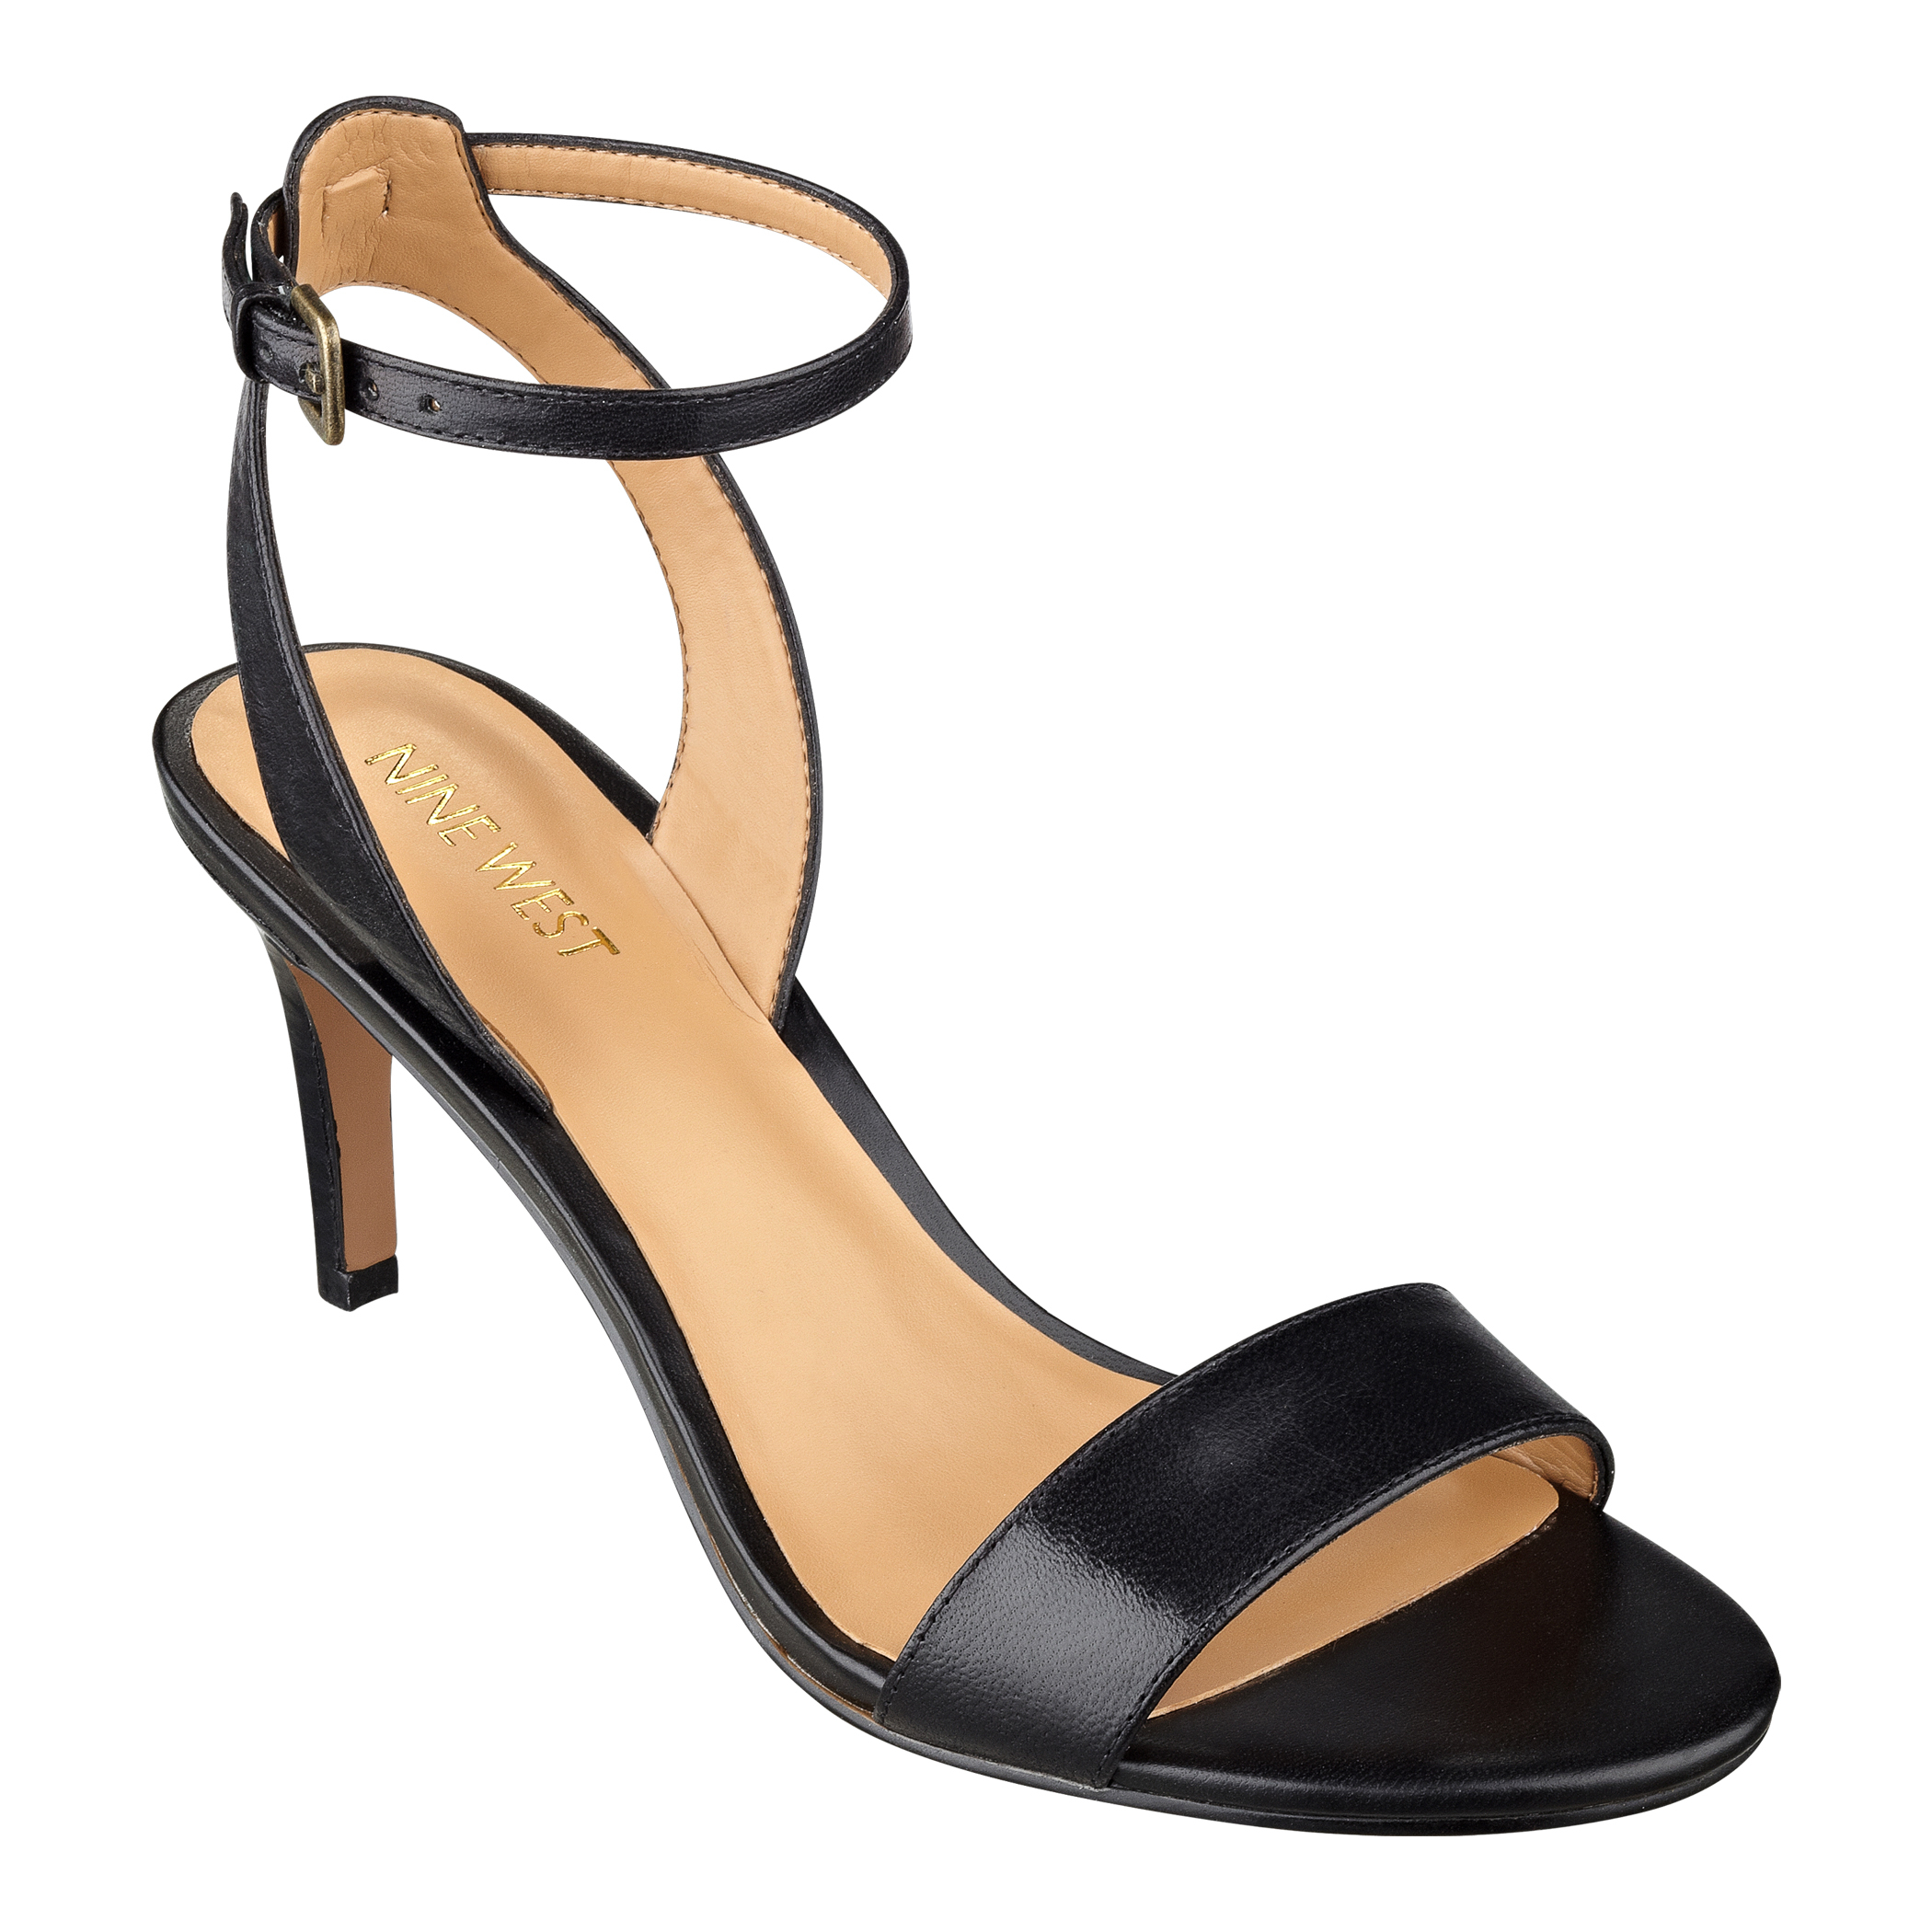 6bdb5ffc1 Nine West Black Sandals